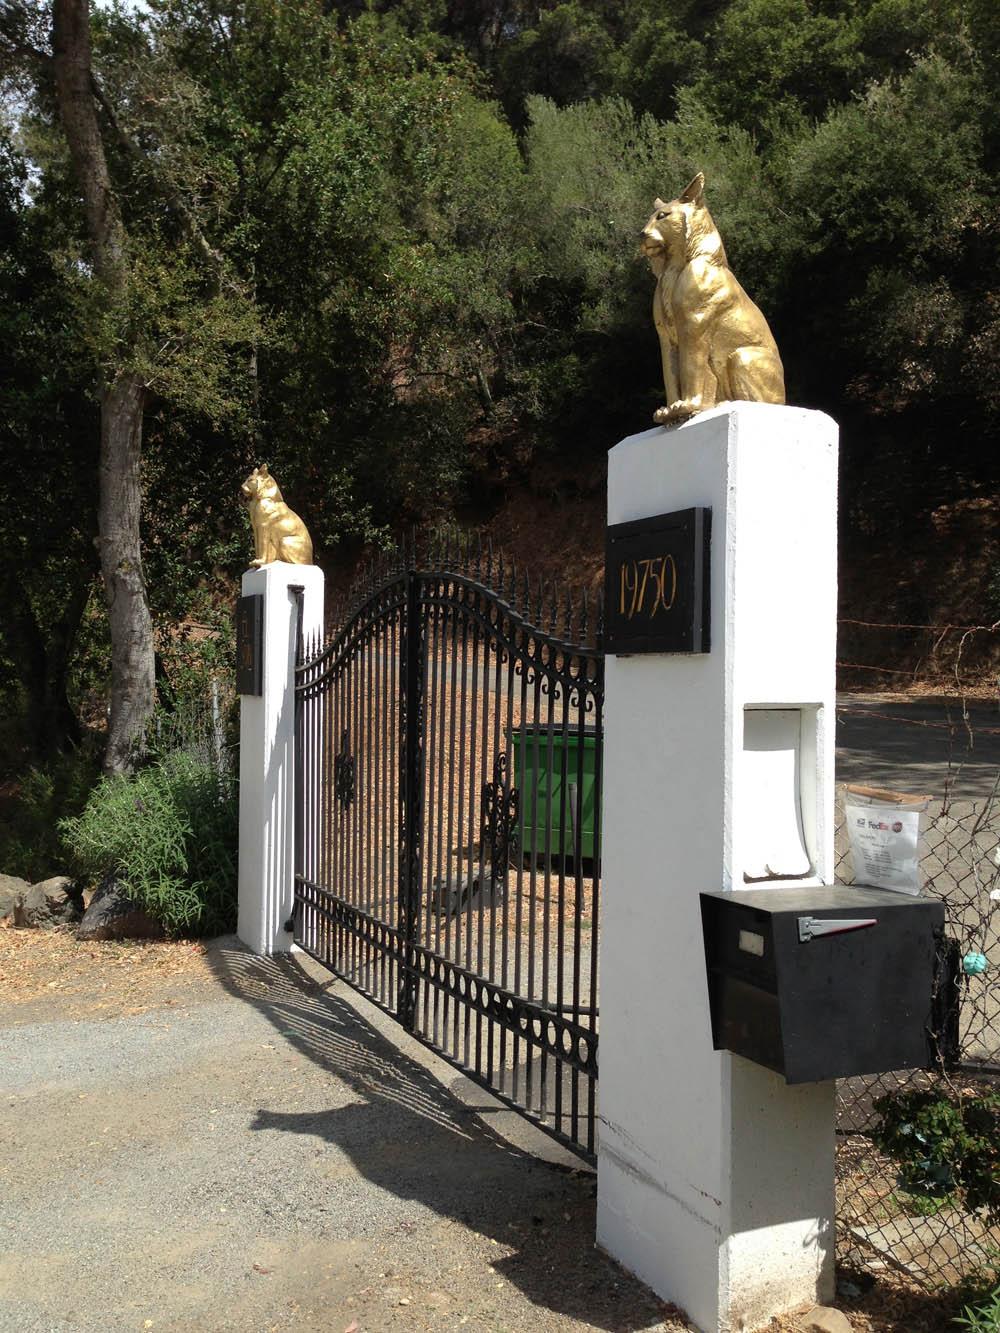 los gatos reserv roadS